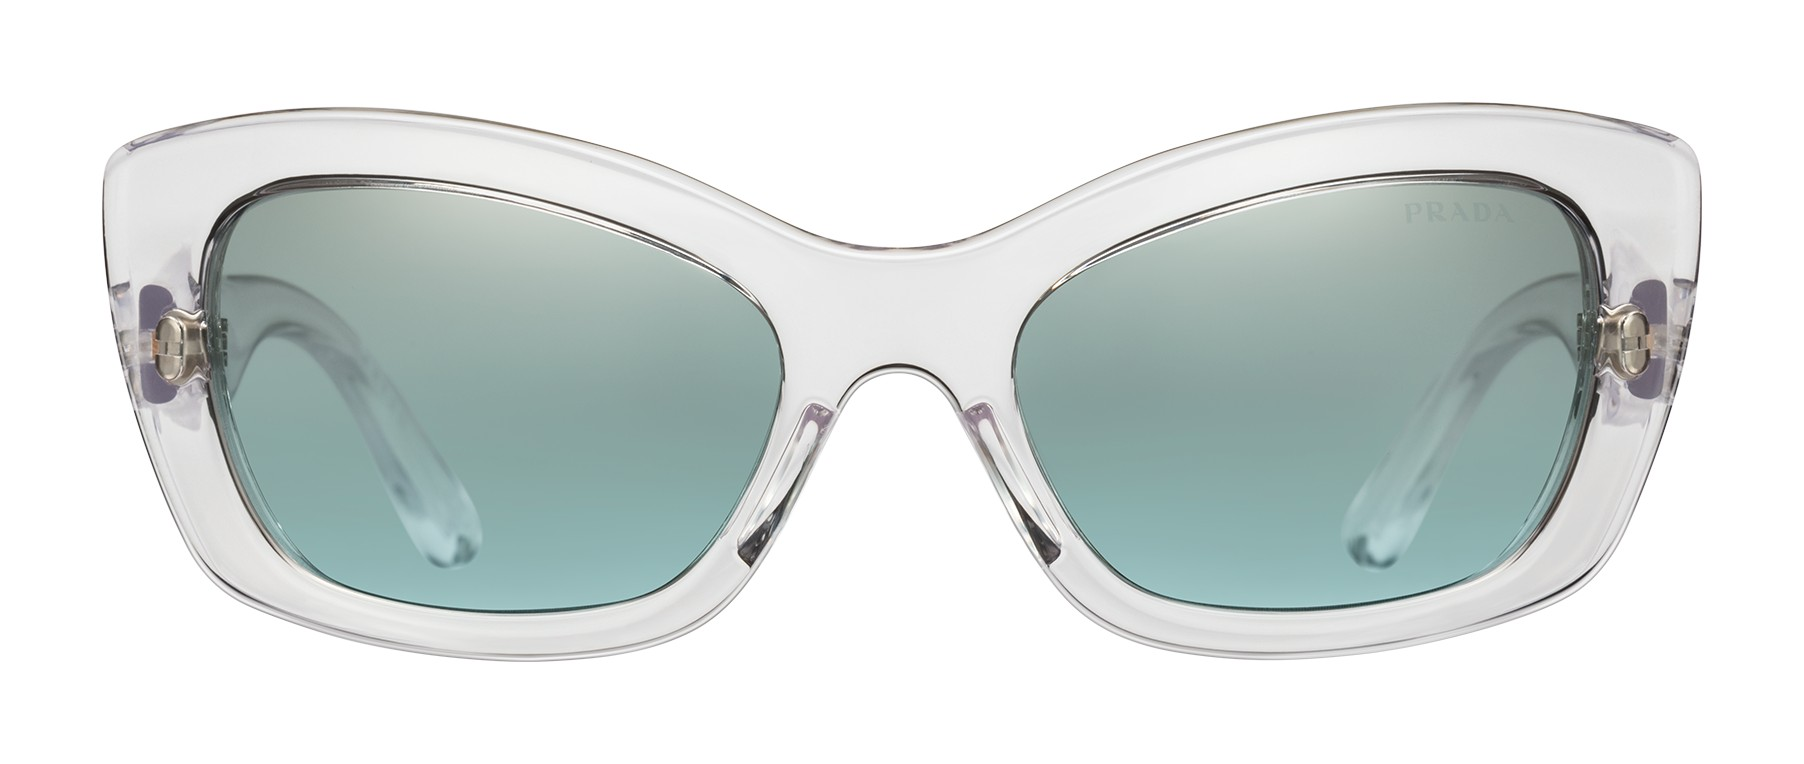 Sunglasses Prada Transparent Fluo Postcard Eye Cat XwvFvYrxq